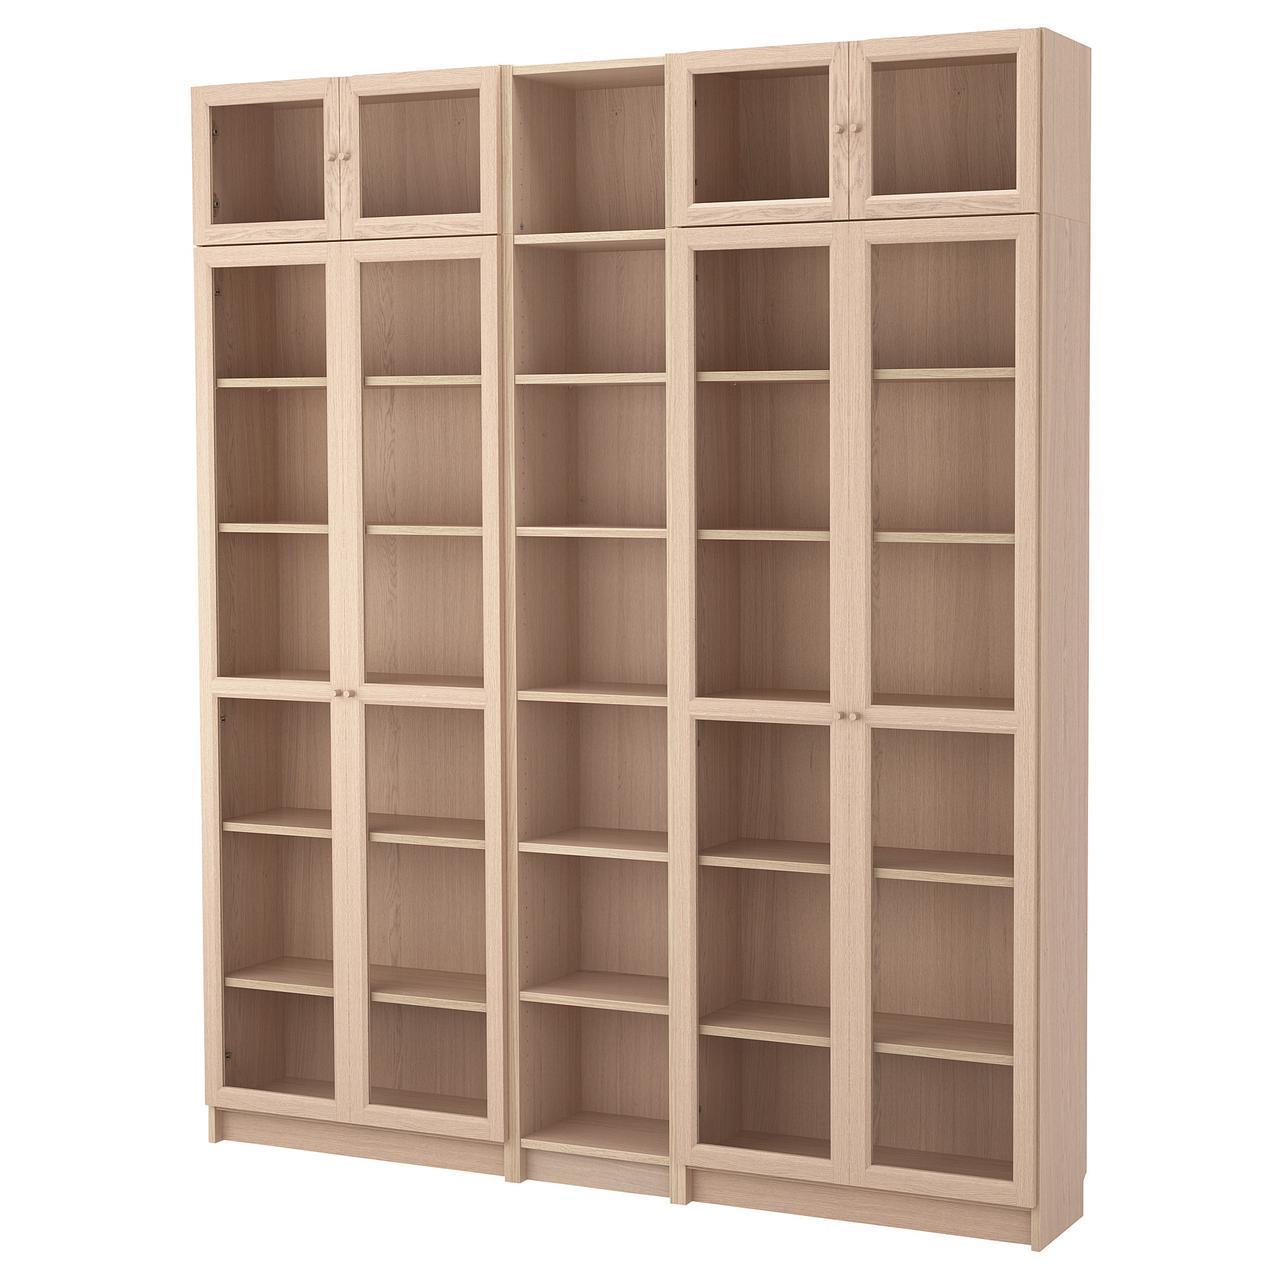 ✅ IKEA BILLY / OXBERG (892.499.69) Книжный шкаф